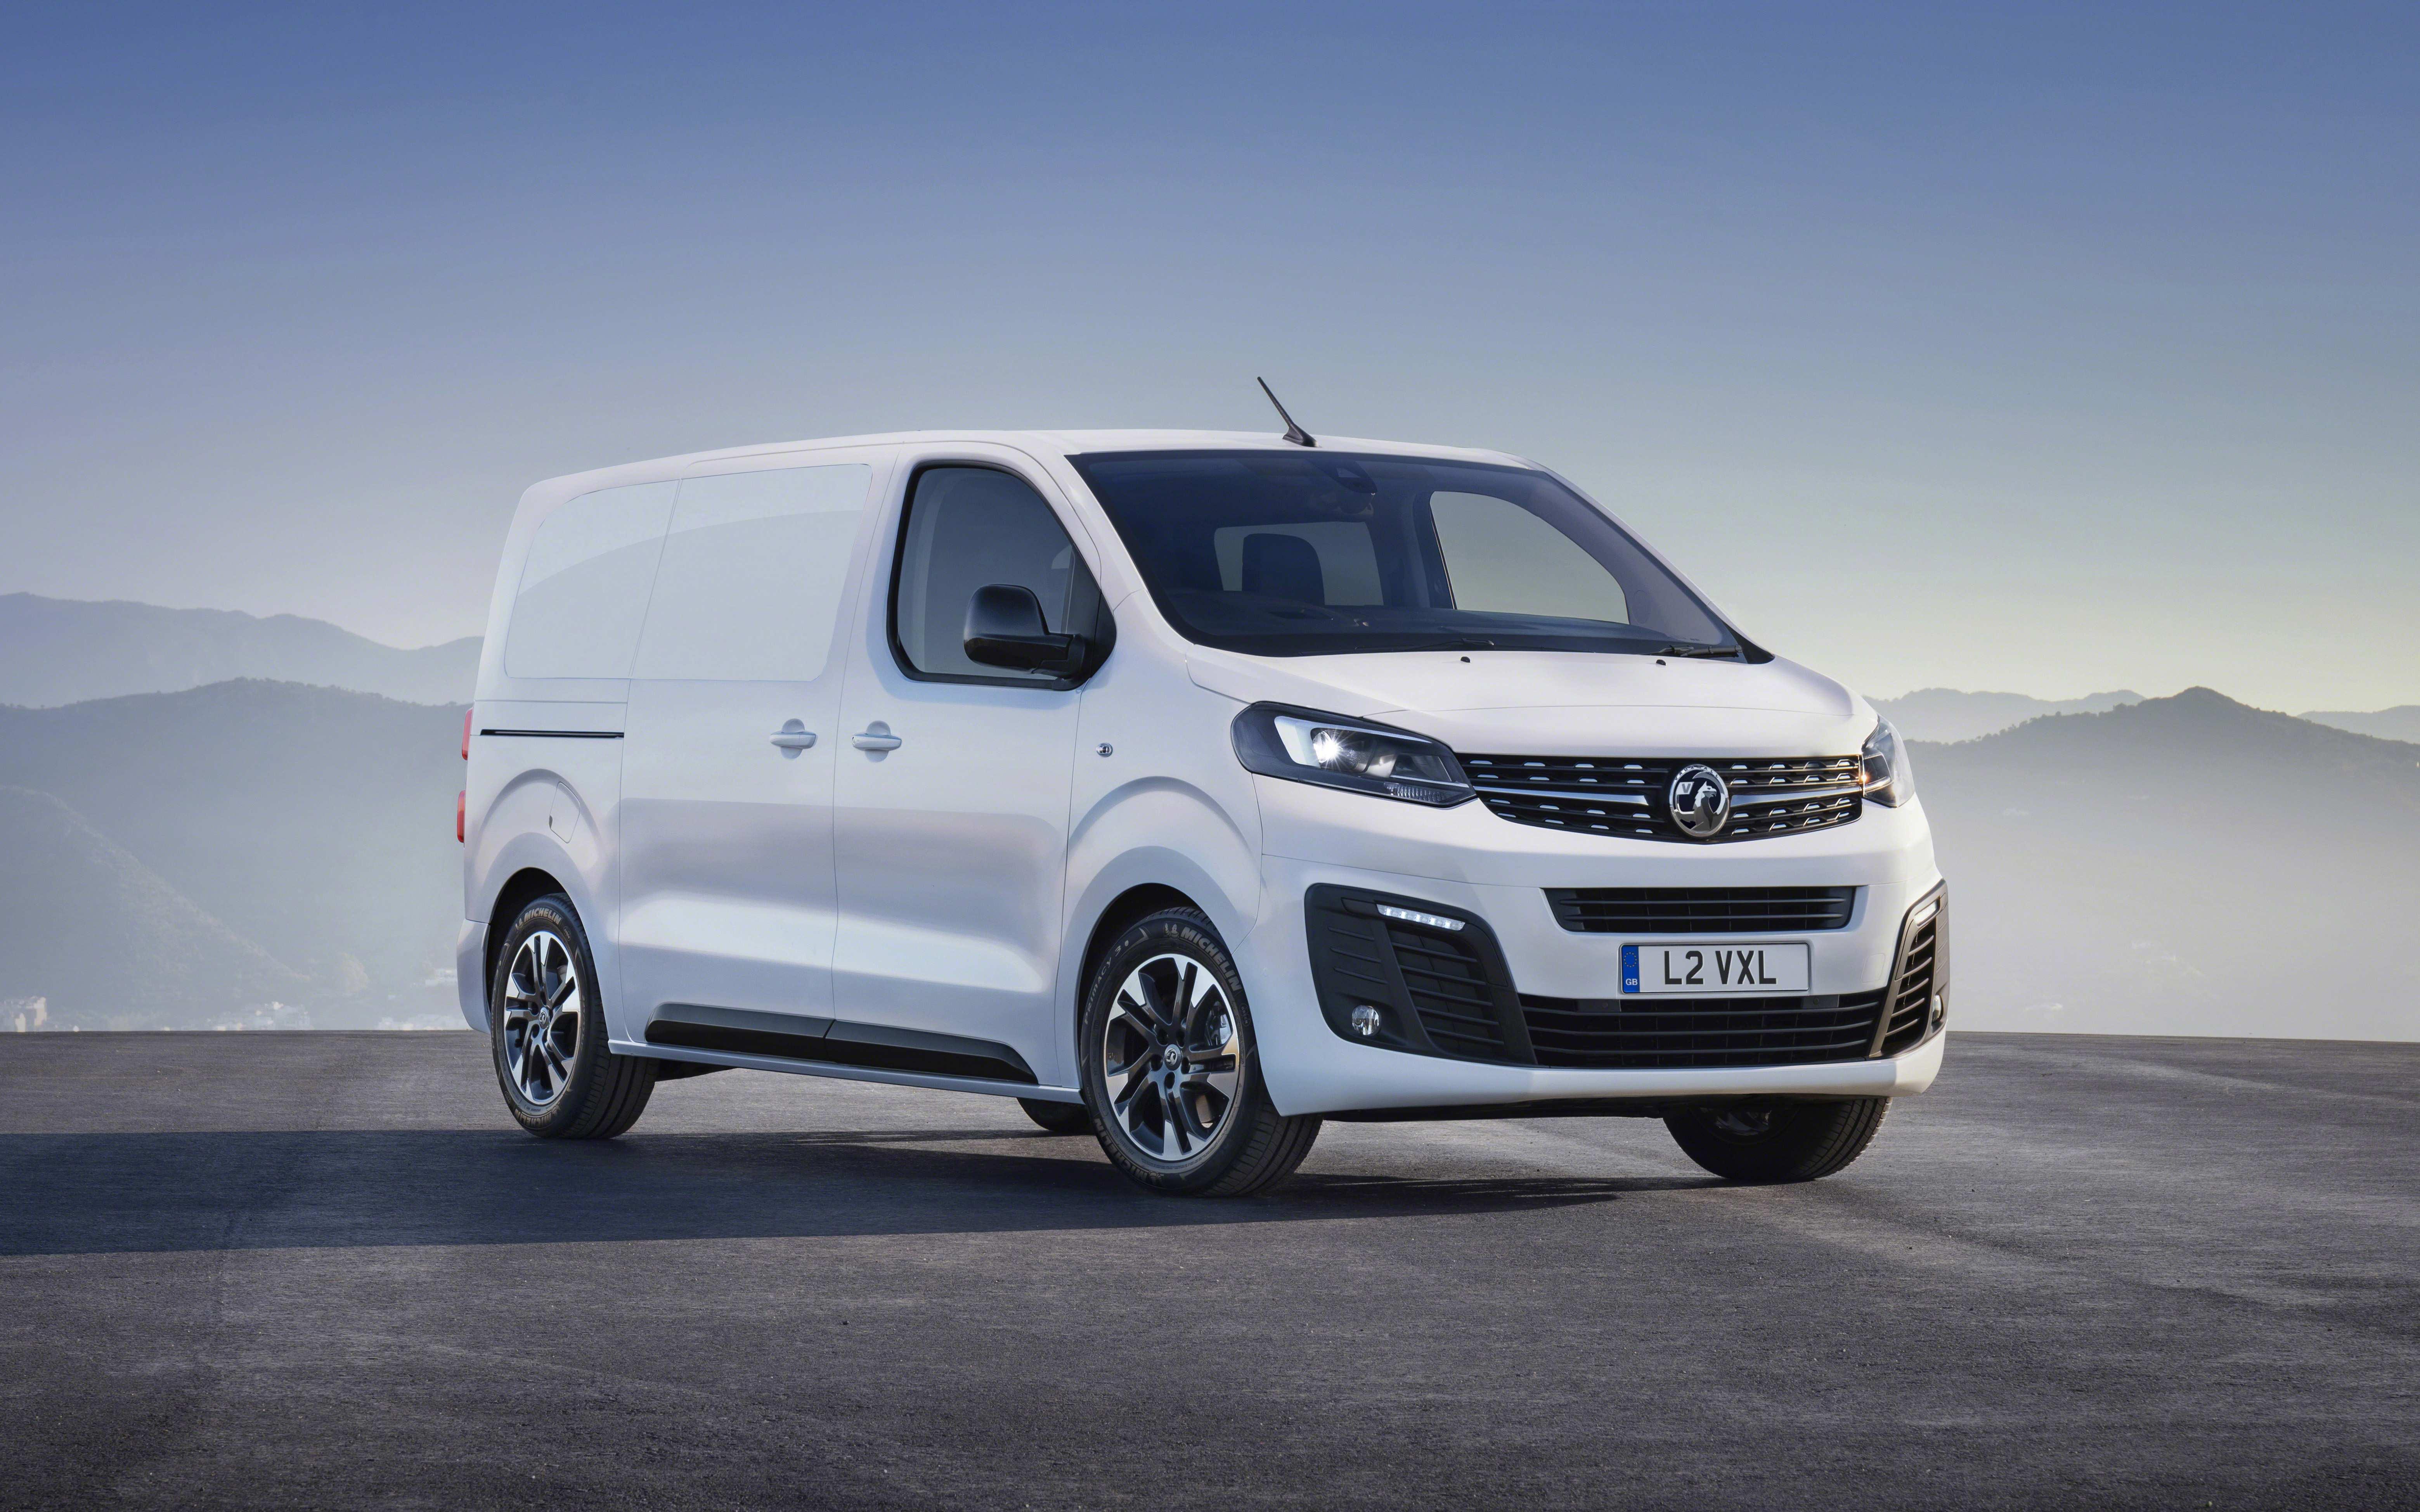 19 Concept of 2019 Opel Vivaro Release Date with 2019 Opel Vivaro